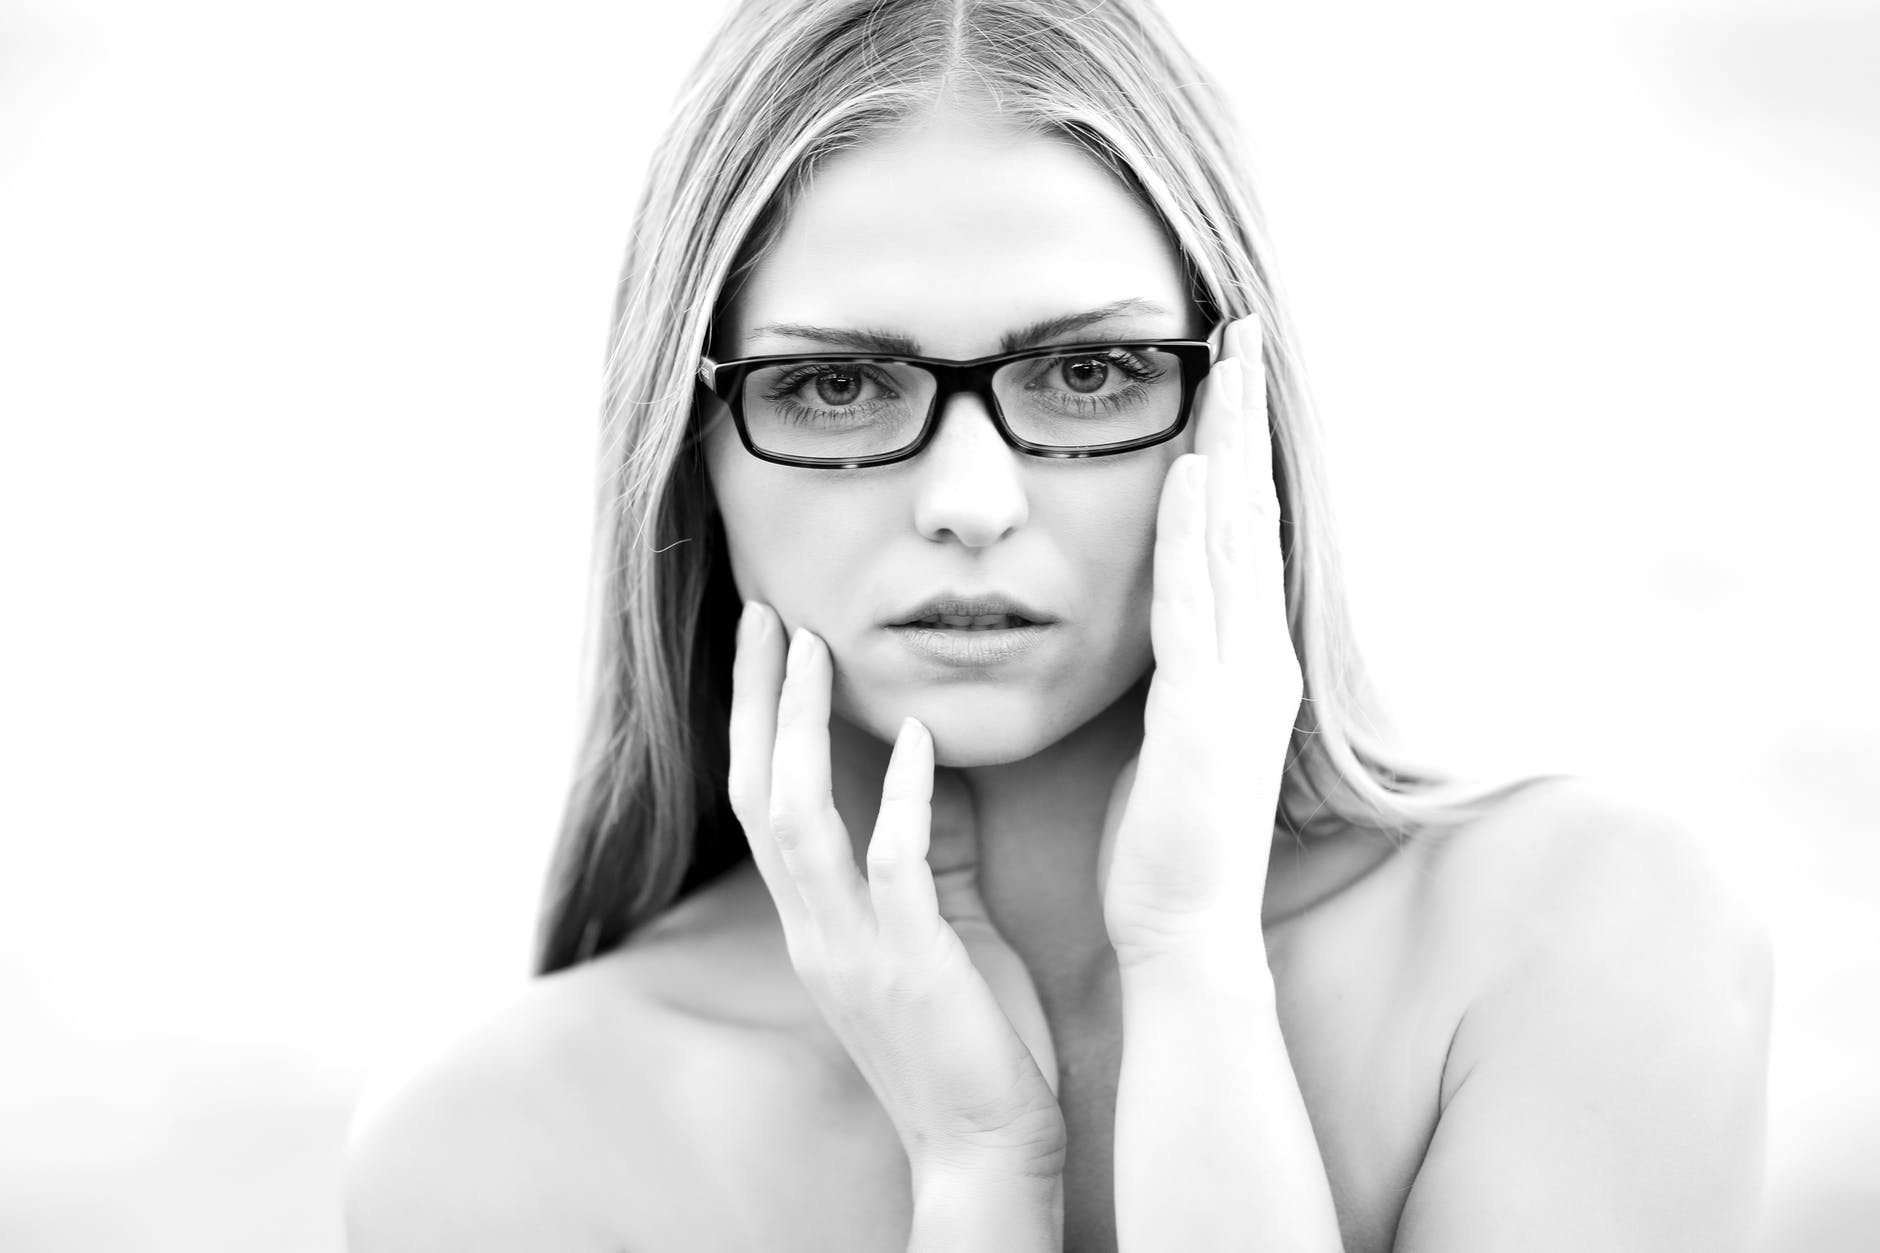 Skin Care for Dry Skin